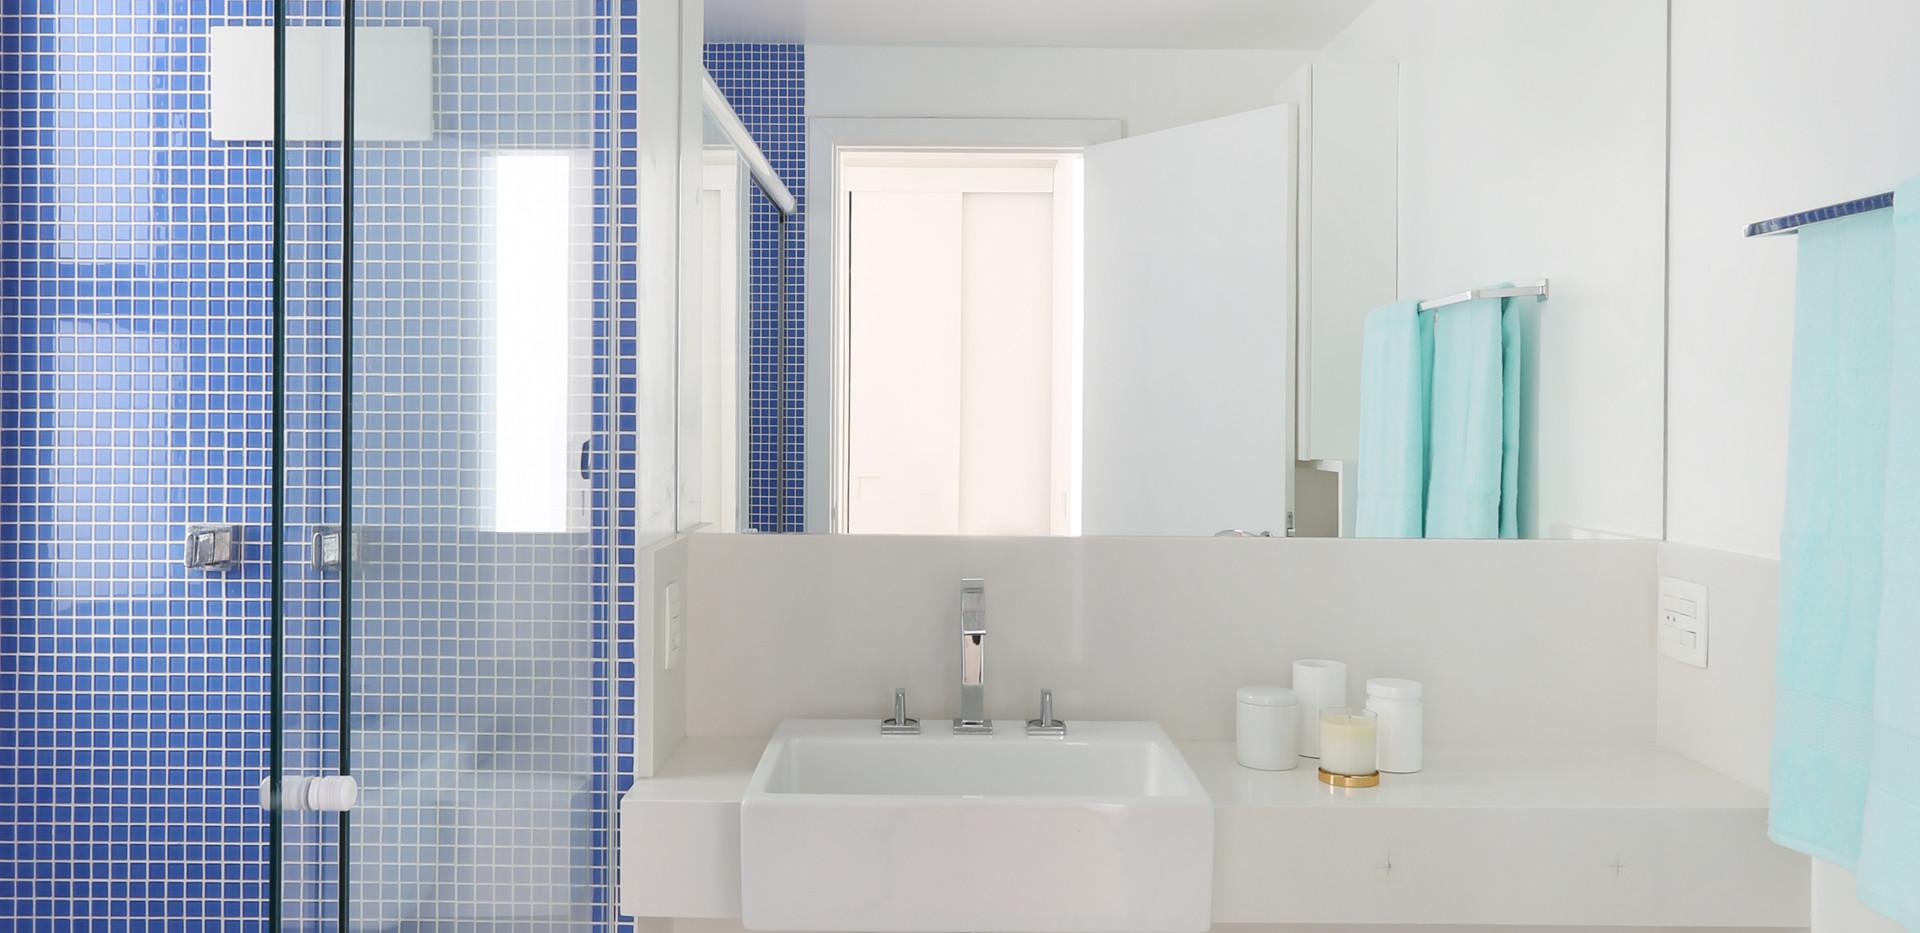 07 - Sala de Banho Casal.jpg